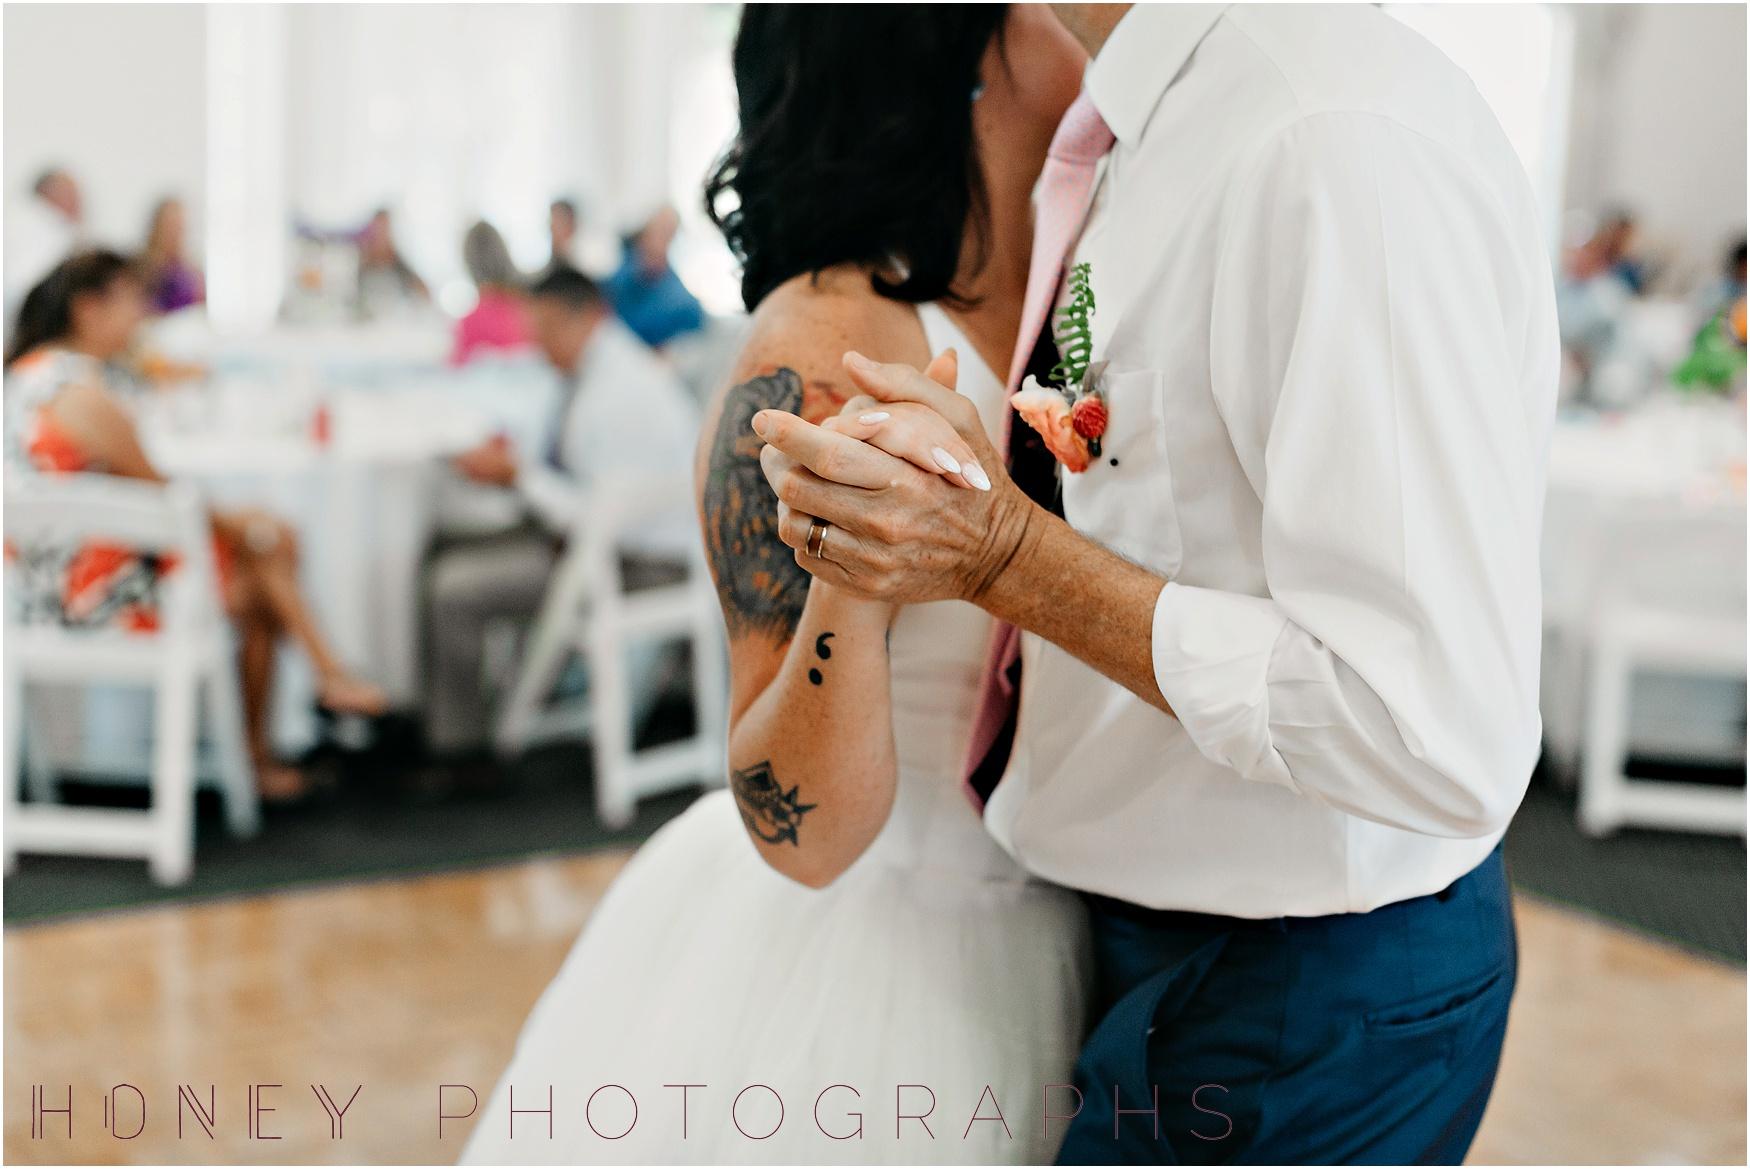 colorful_ecclectic_vibrant_vista_rainbow_quirky_wedding054.jpg